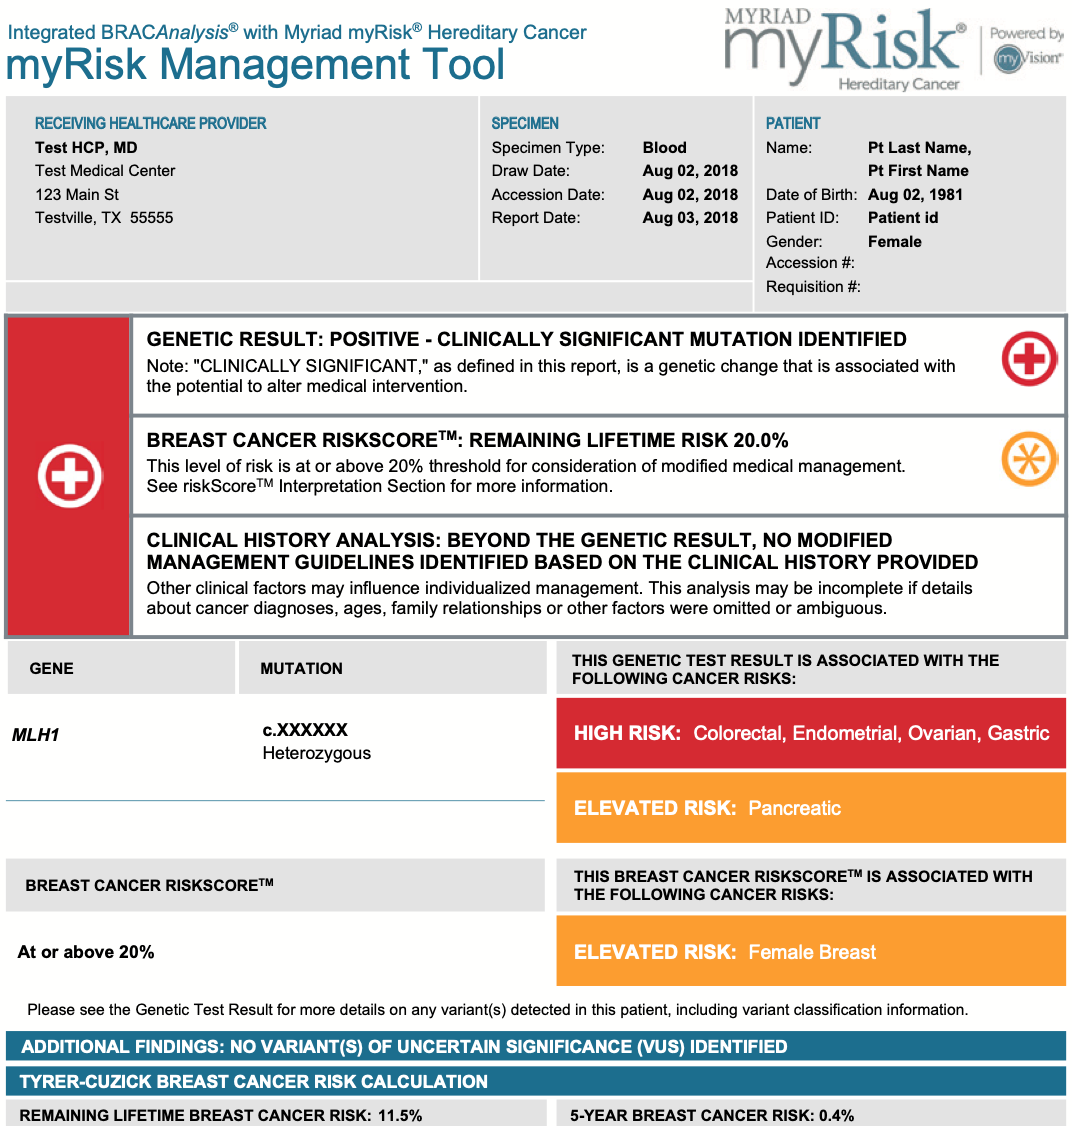 myRisk Management Tool